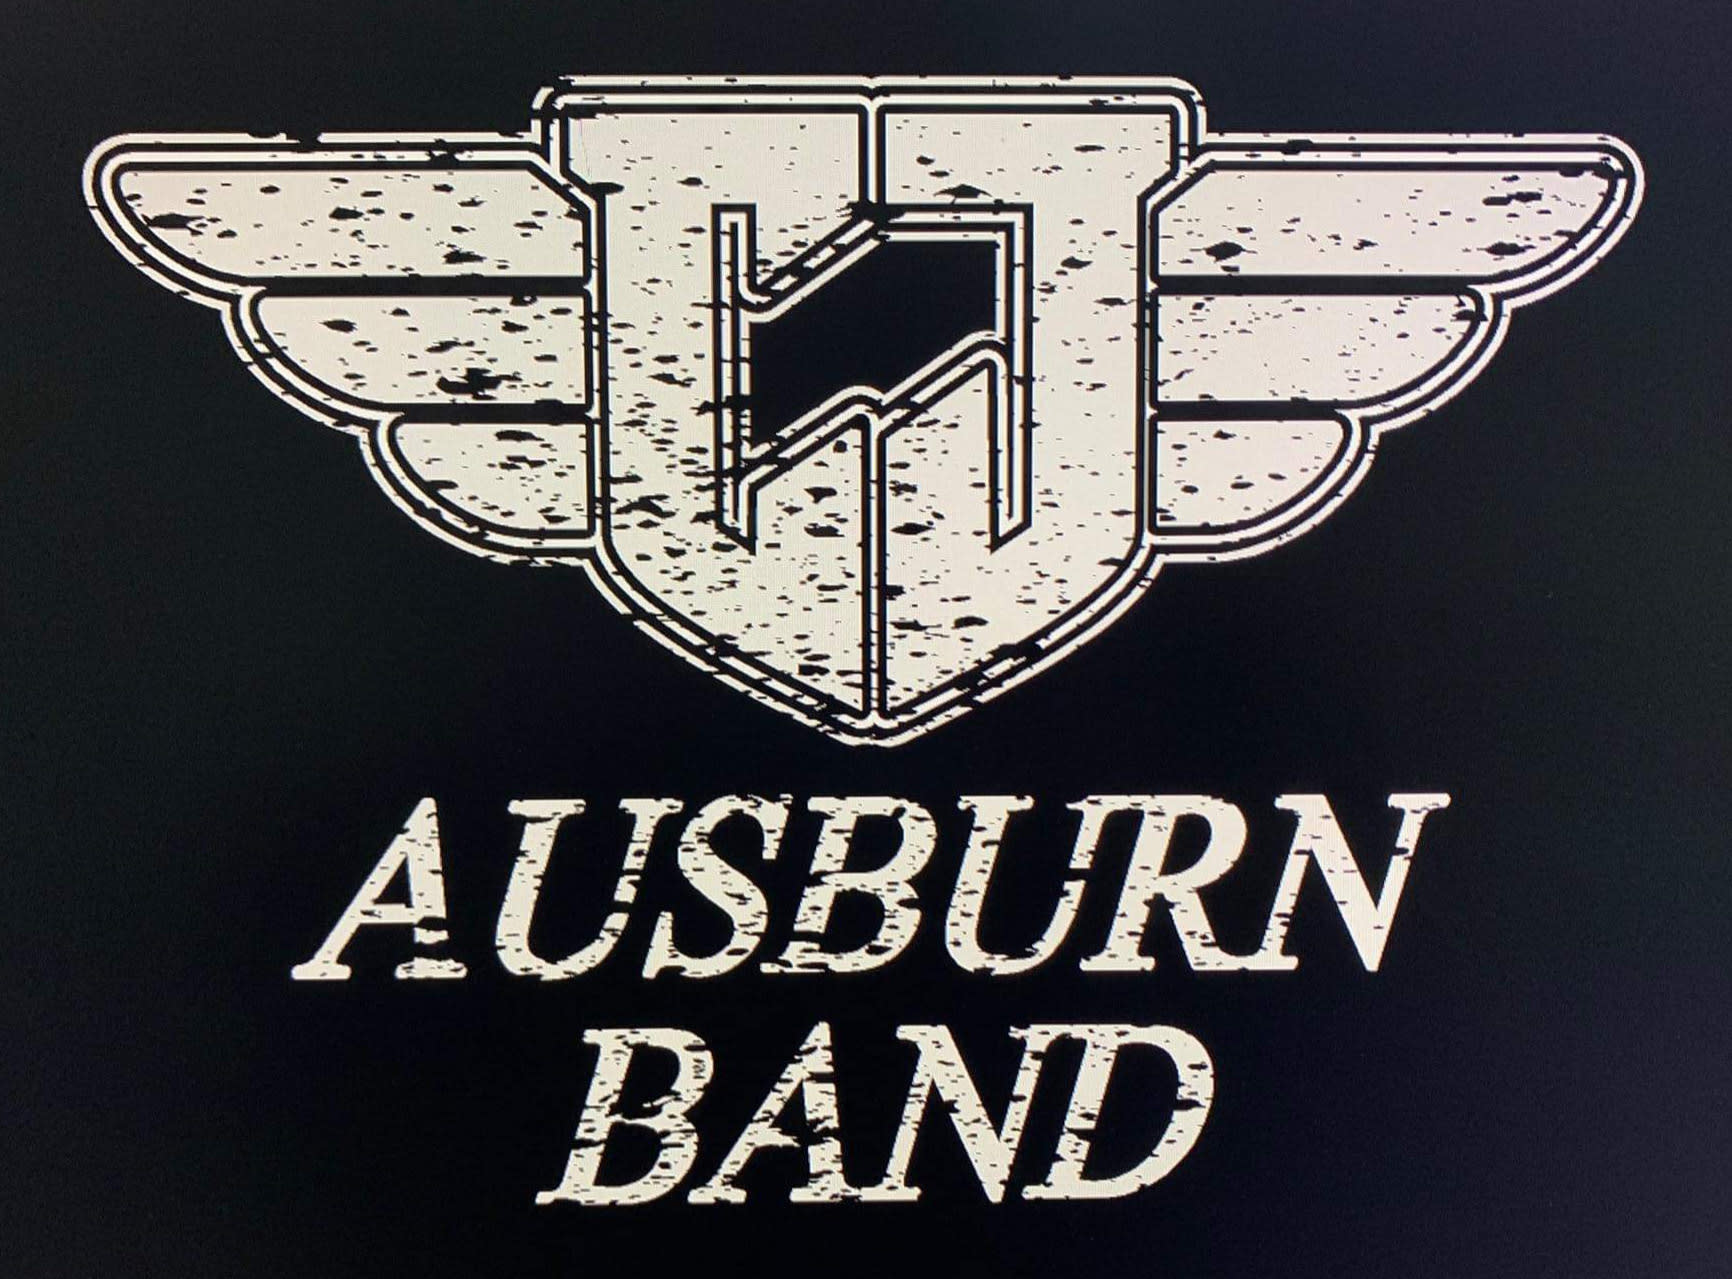 CJ Ausburn Band